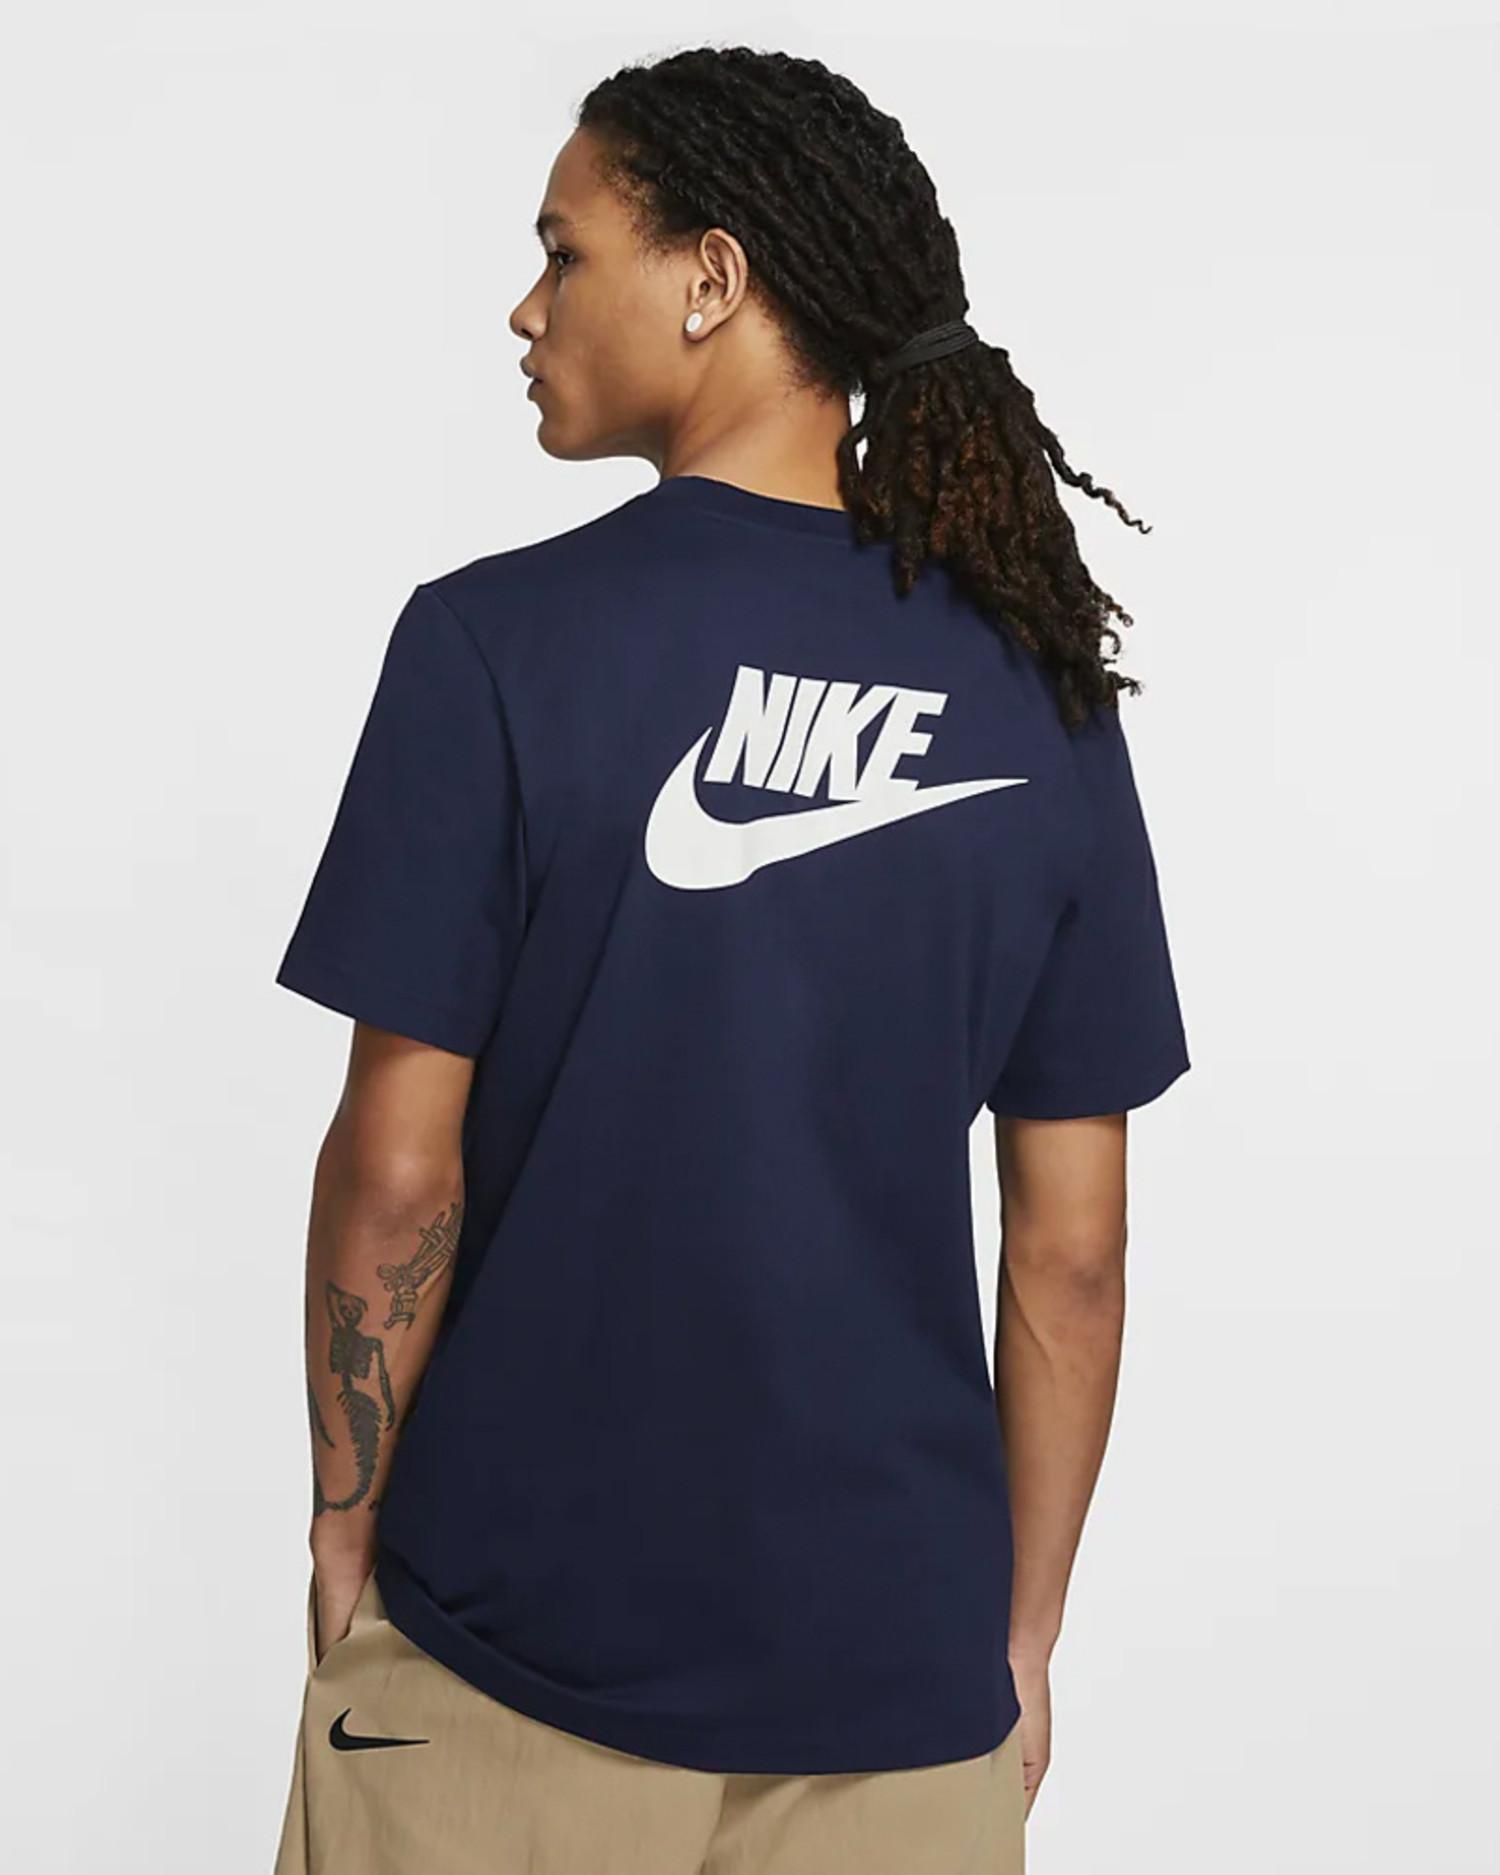 Nike Stranger Things Shortsleeve Tee College navy/sail